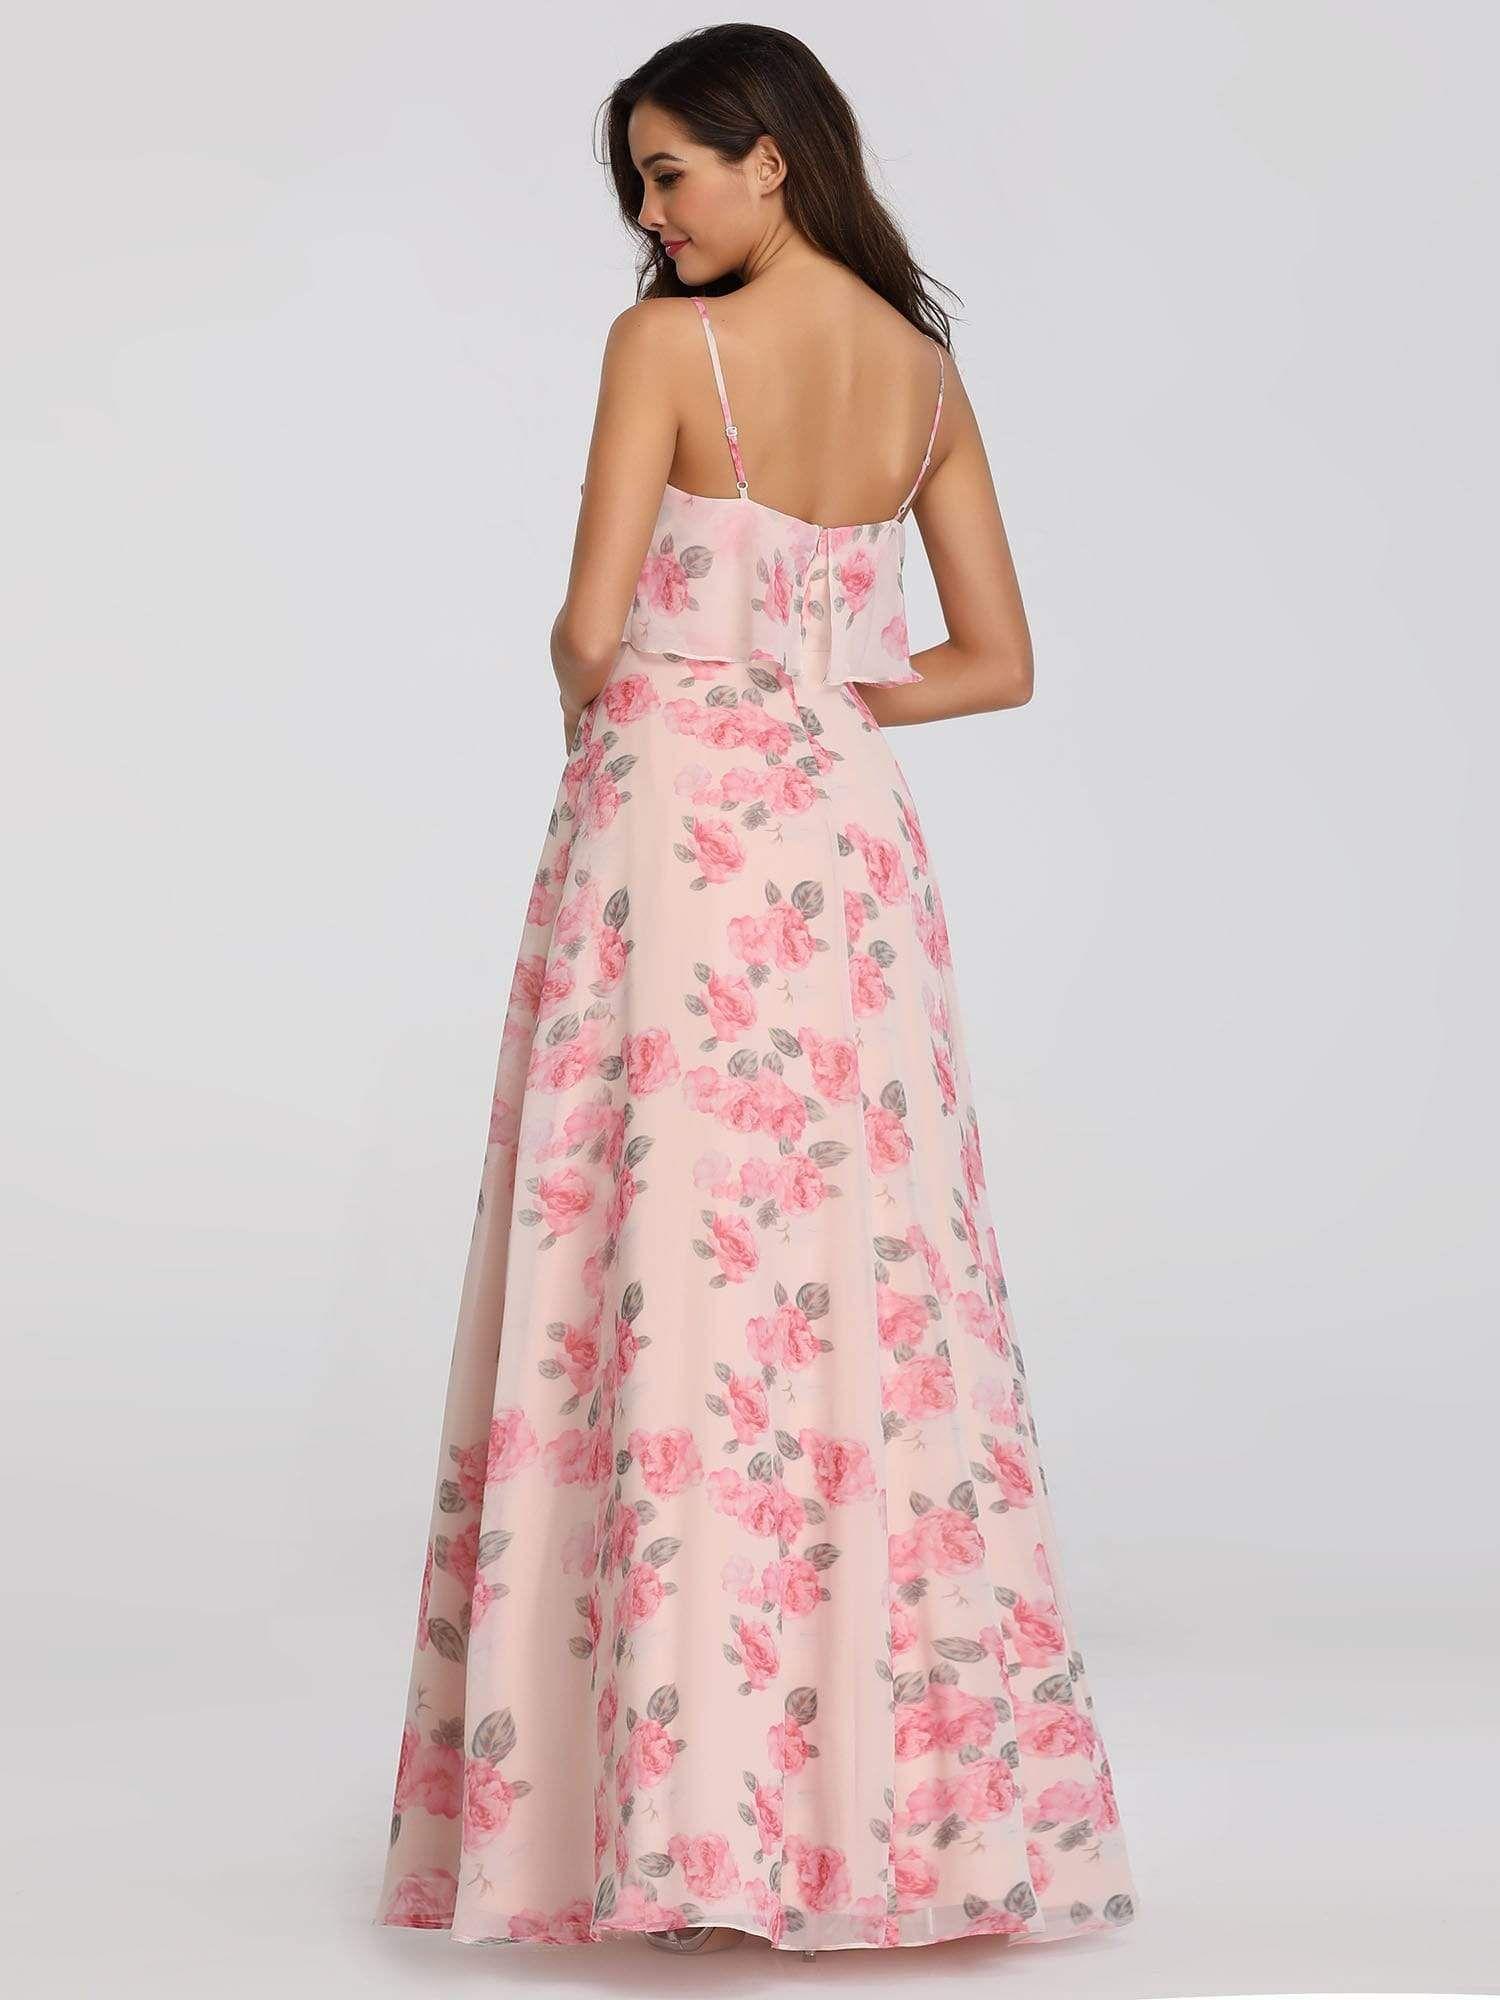 Spaghetti Straps Long Floral Print Maxi Dress - Ever ...